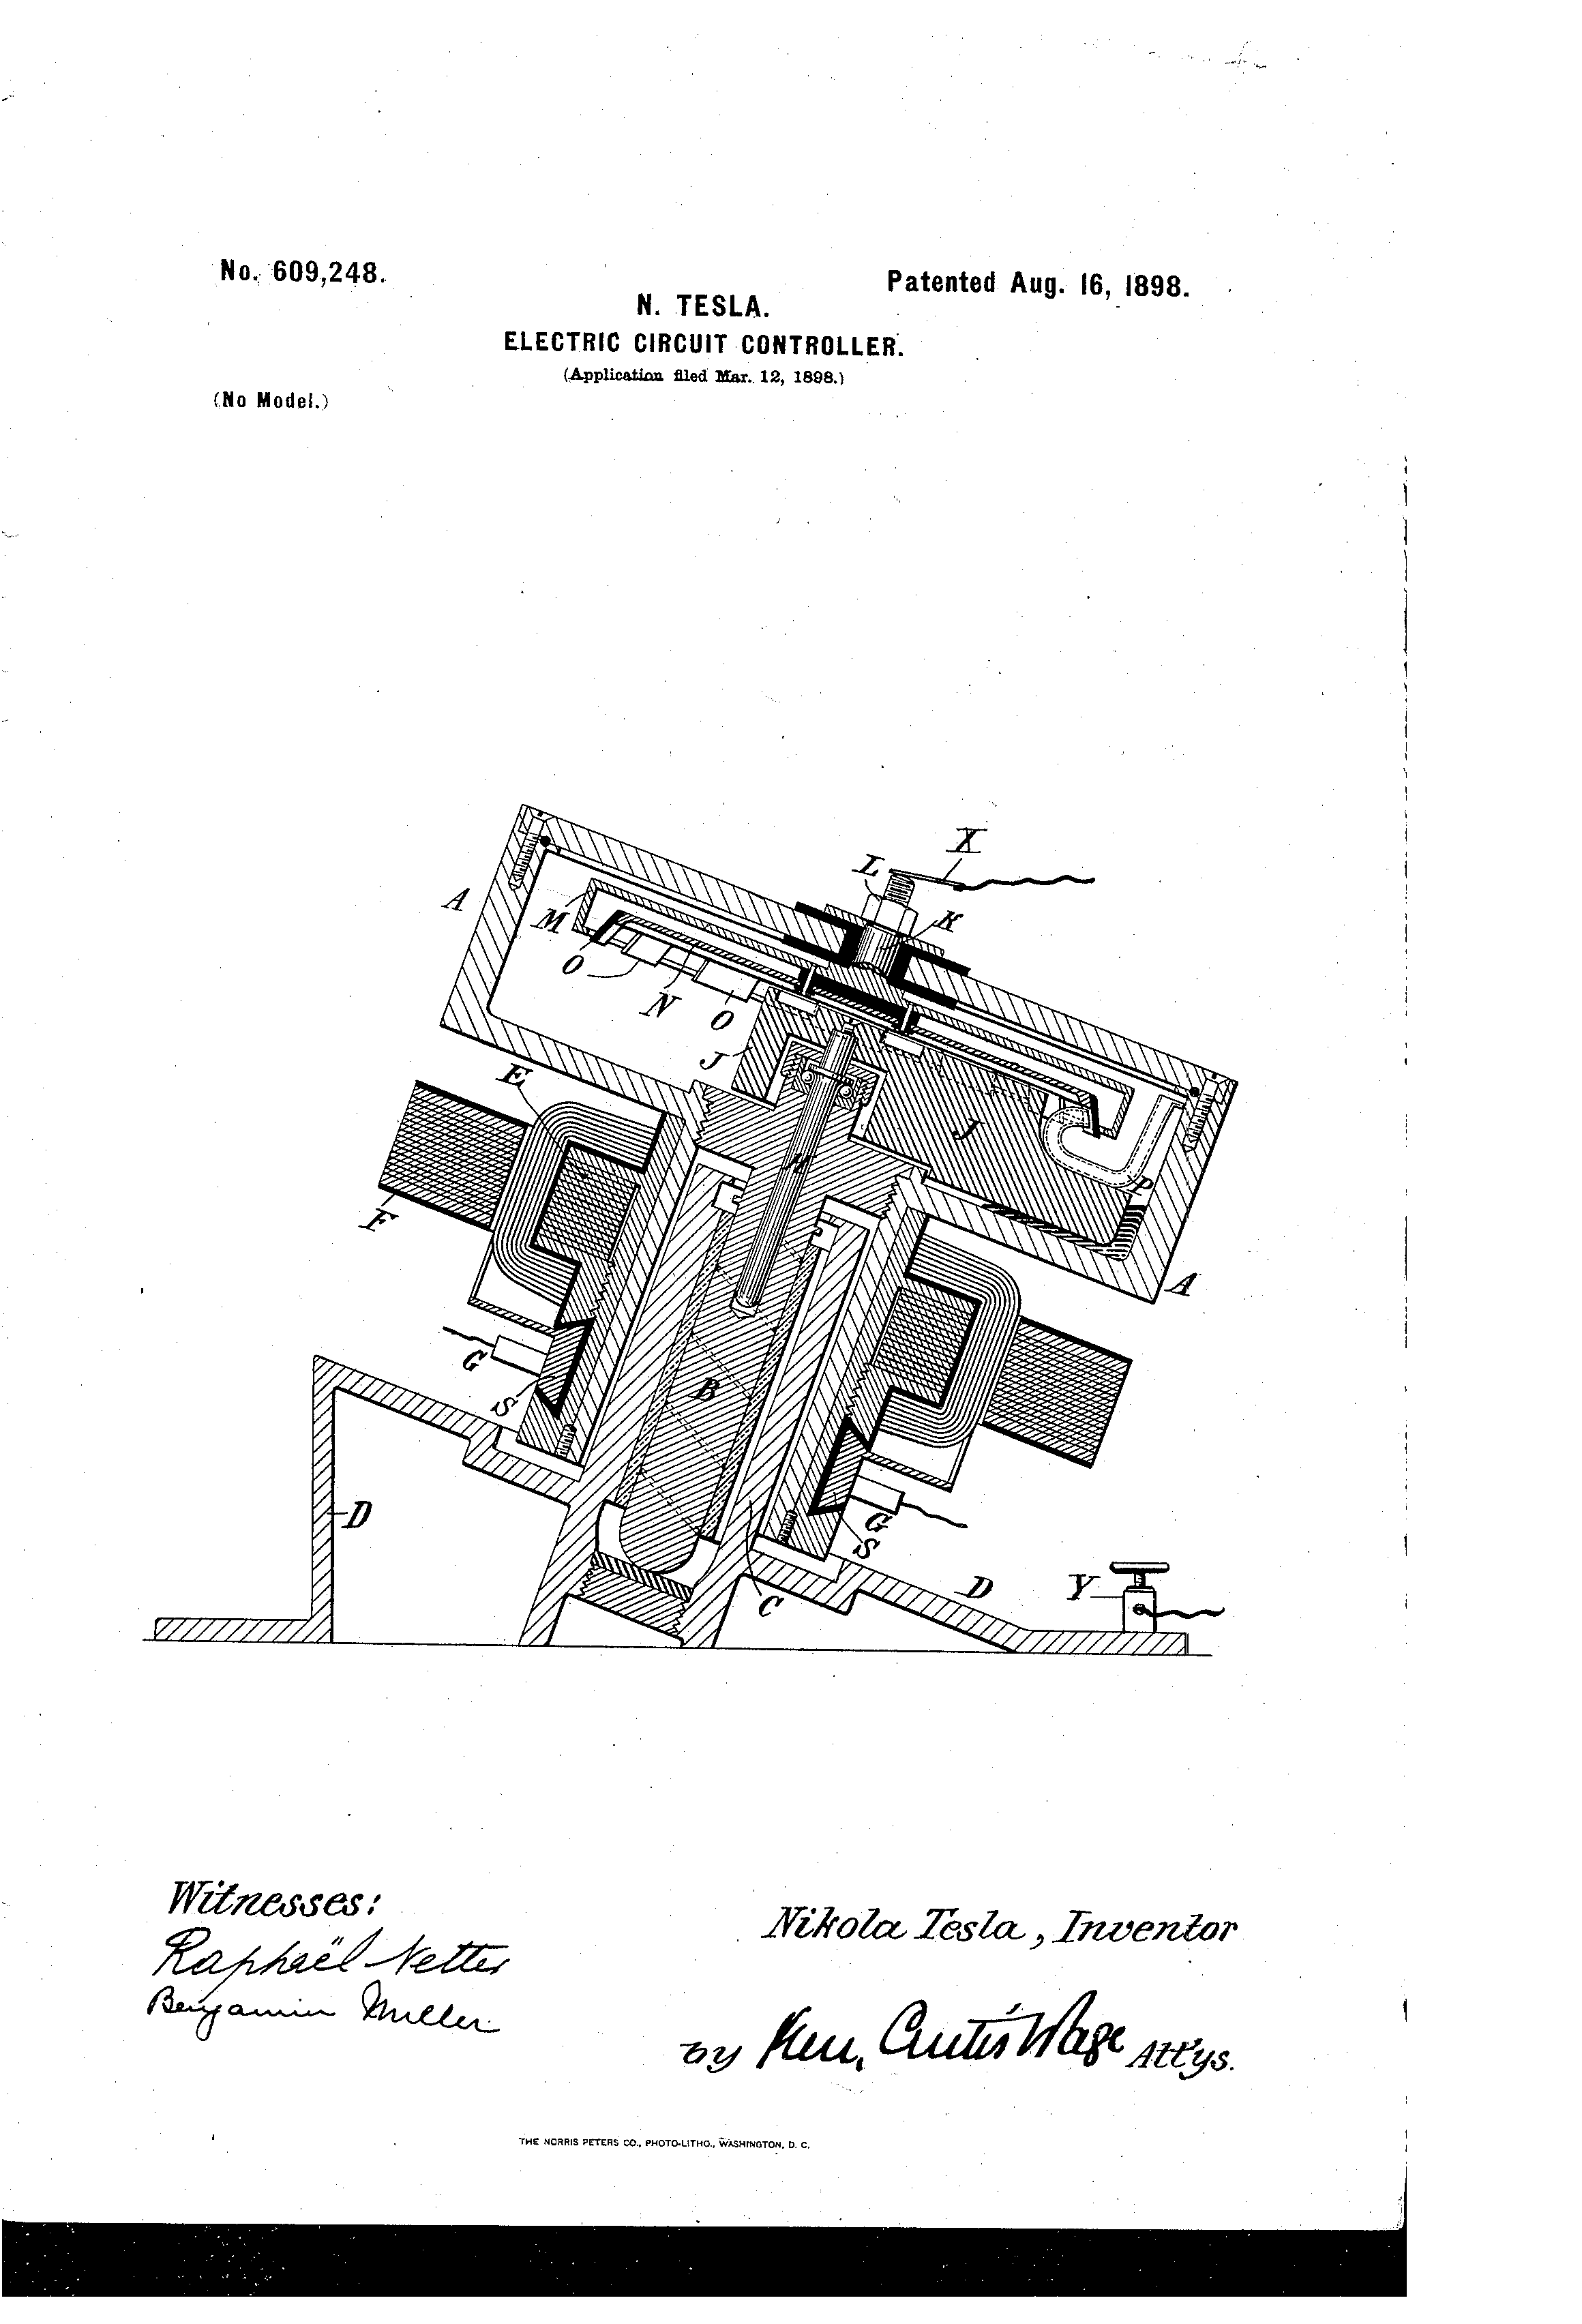 patent us609248 - nikola tesla